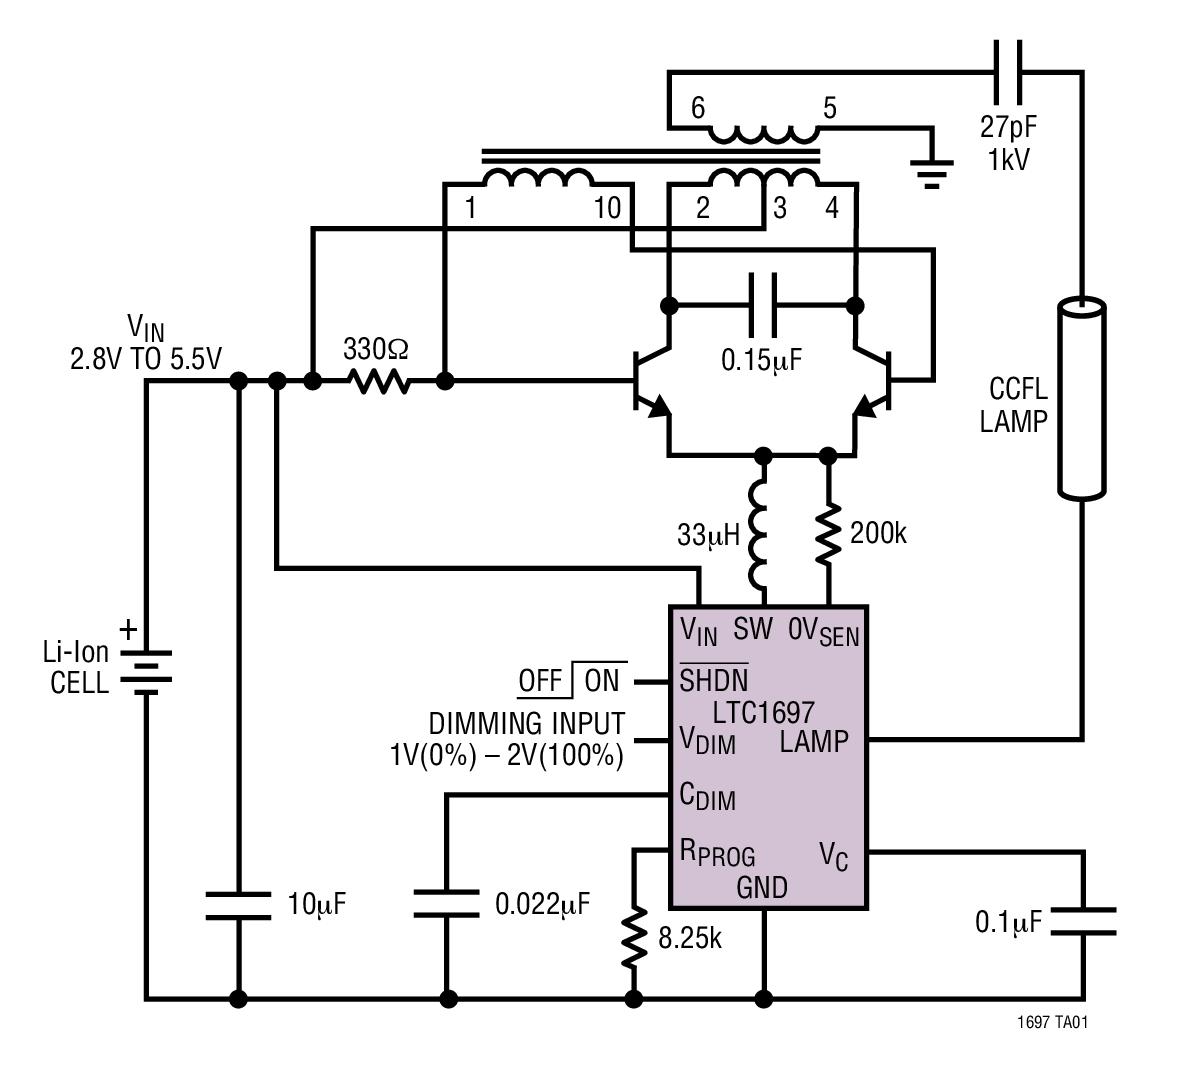 LTC1697 高效率、低功率 1W CCFL 开关稳压器